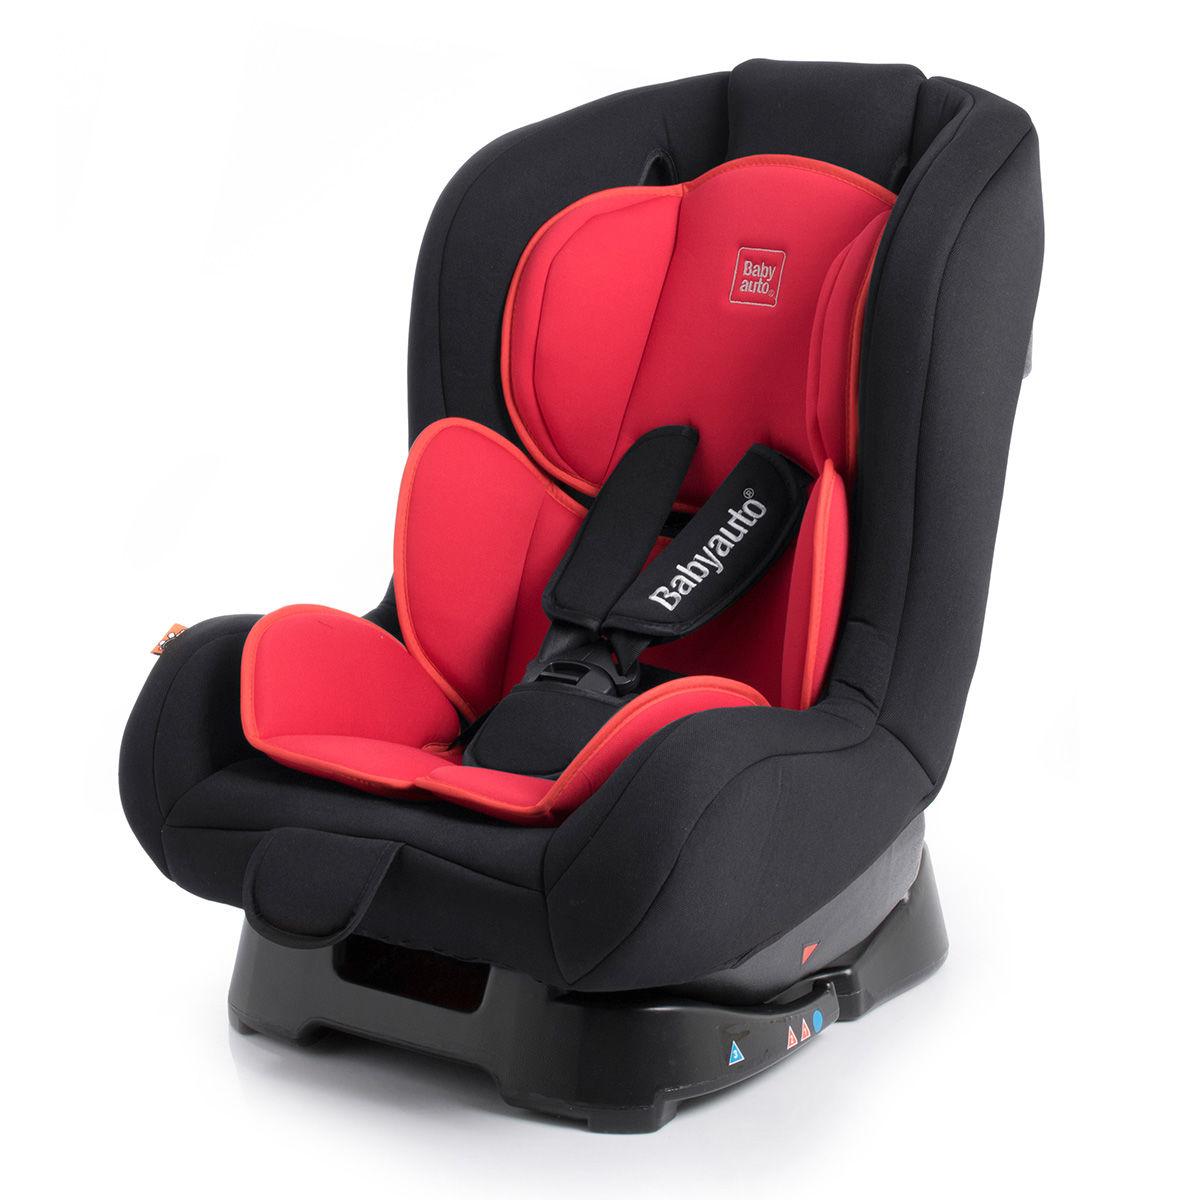 Afbeelding van Autostoel Babyauto Lolo Rood (0-18kg)